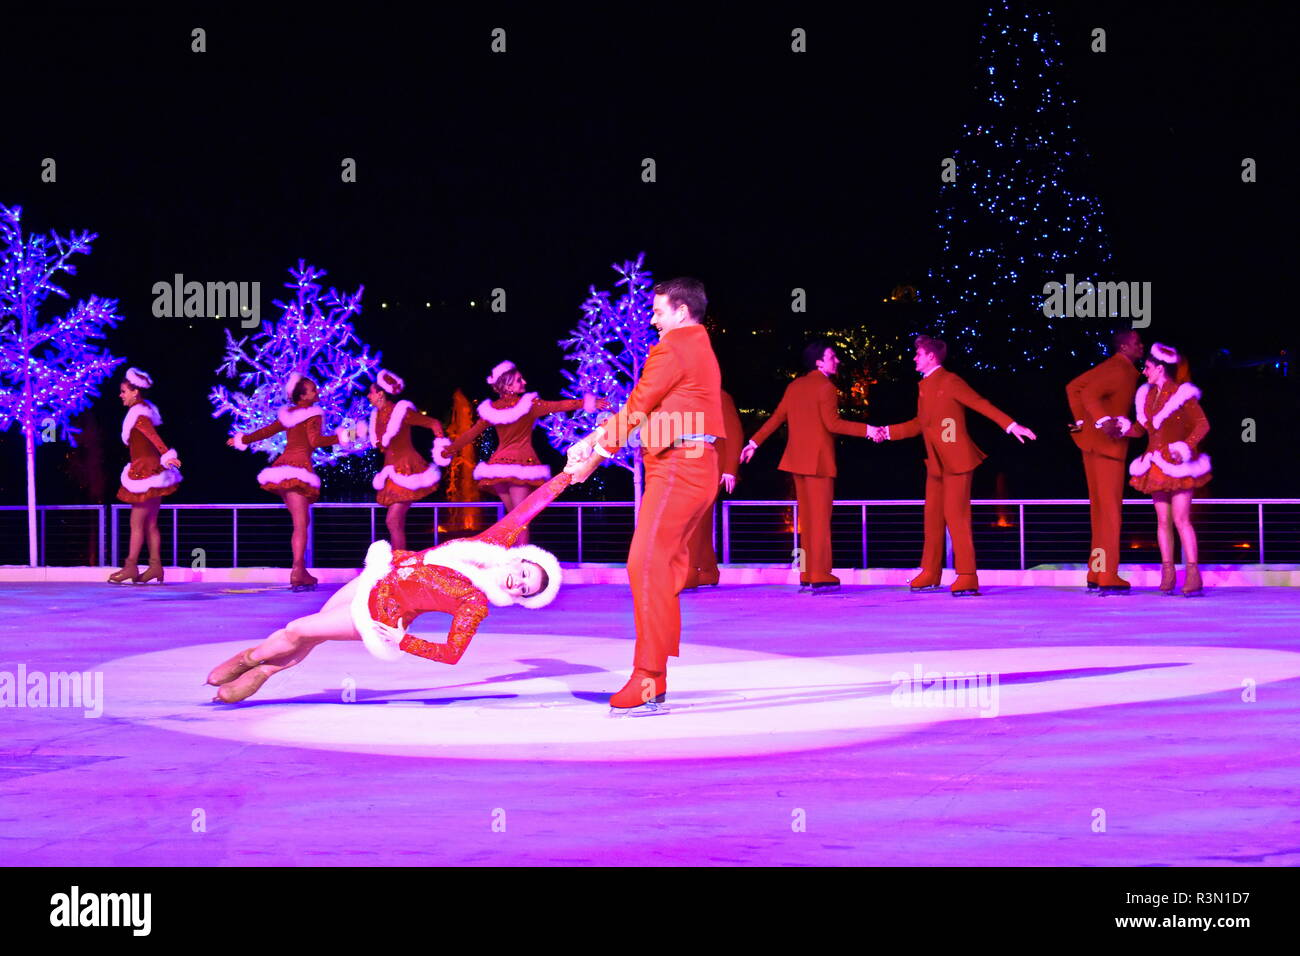 Christmas On Ice.Orlando Florida November 17 2018 Professional Figure